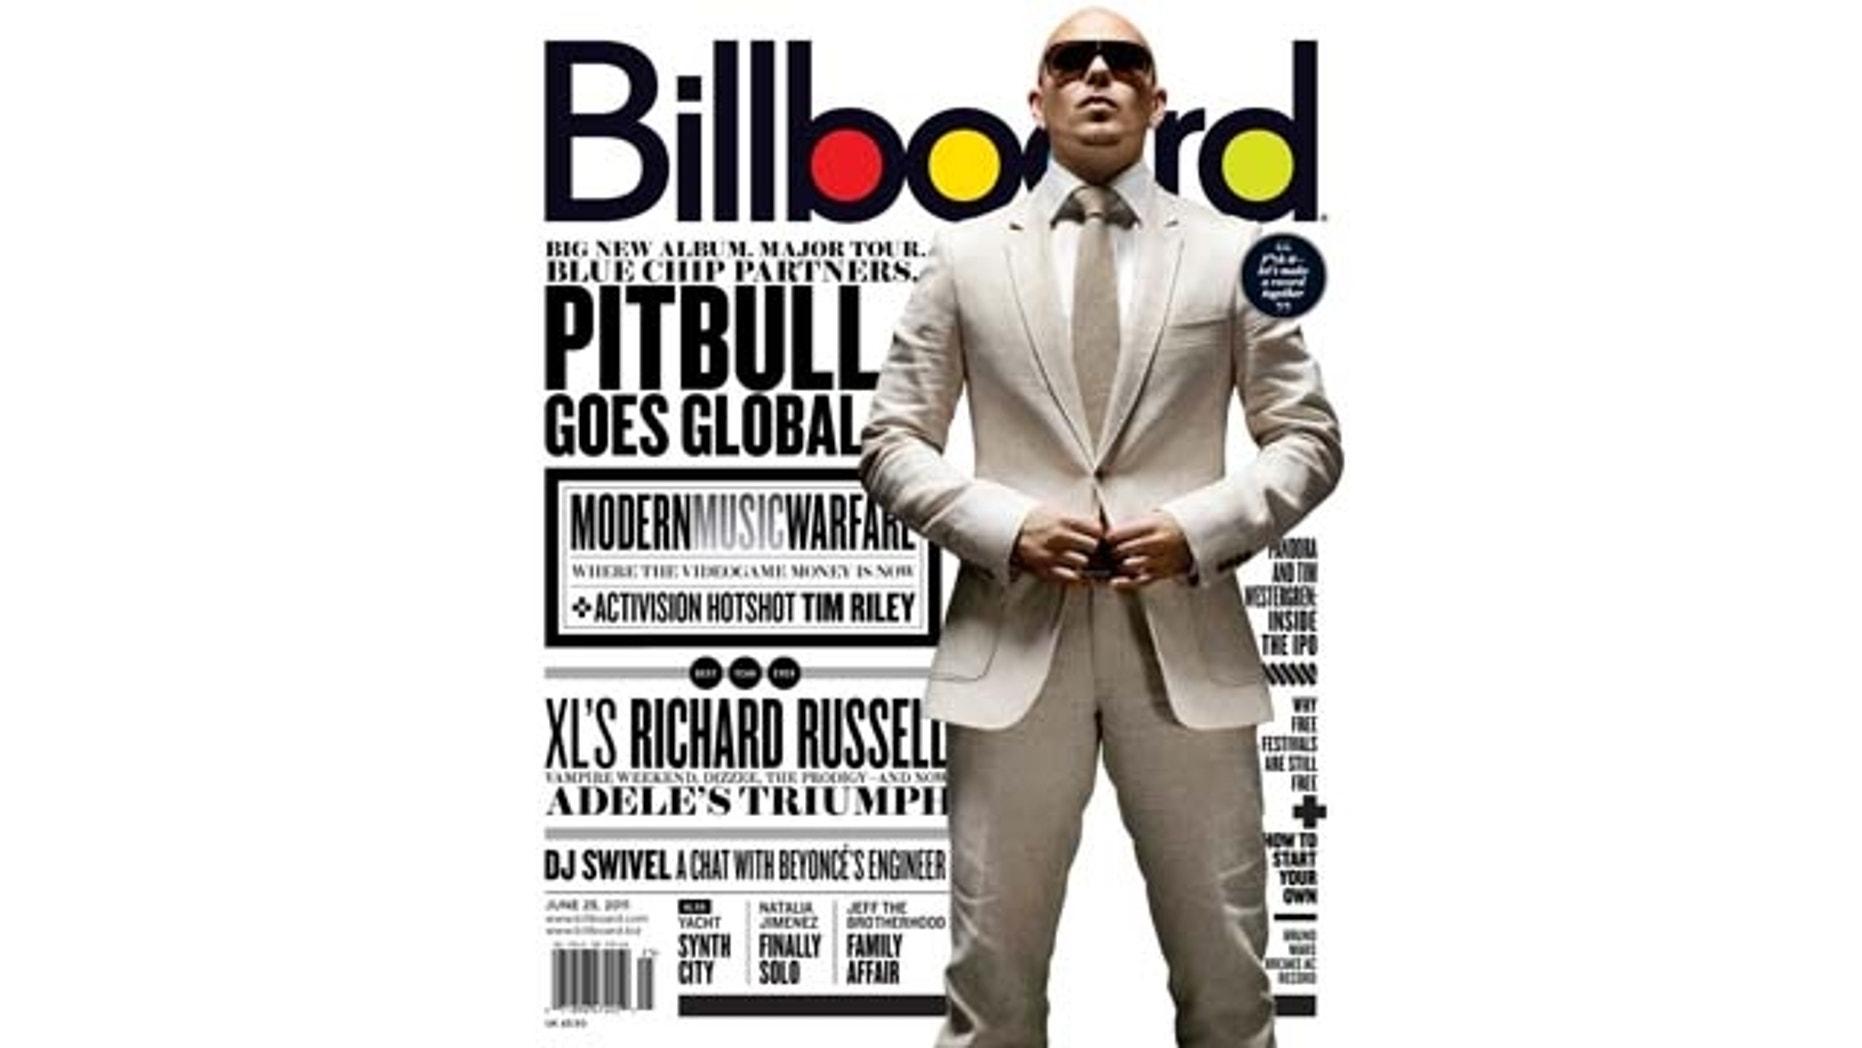 June 23, 2011: International superstar Pitbull on the cover of Billboard magazine's latest issue.